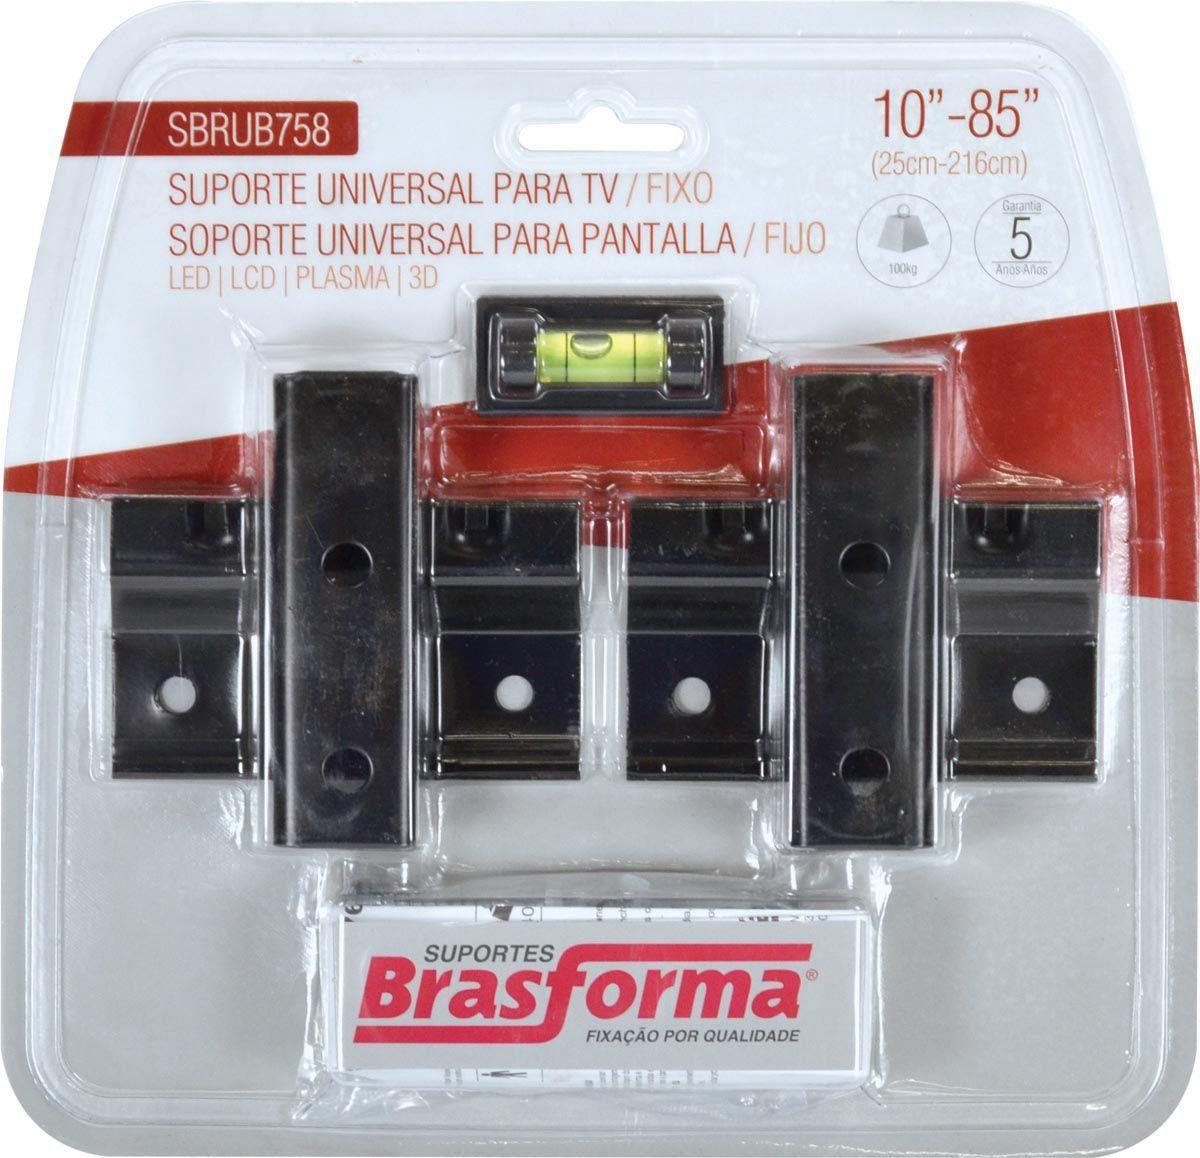 Suporte Universal TV/LCD SBRUB758B Preto Blister - BRASFORMA